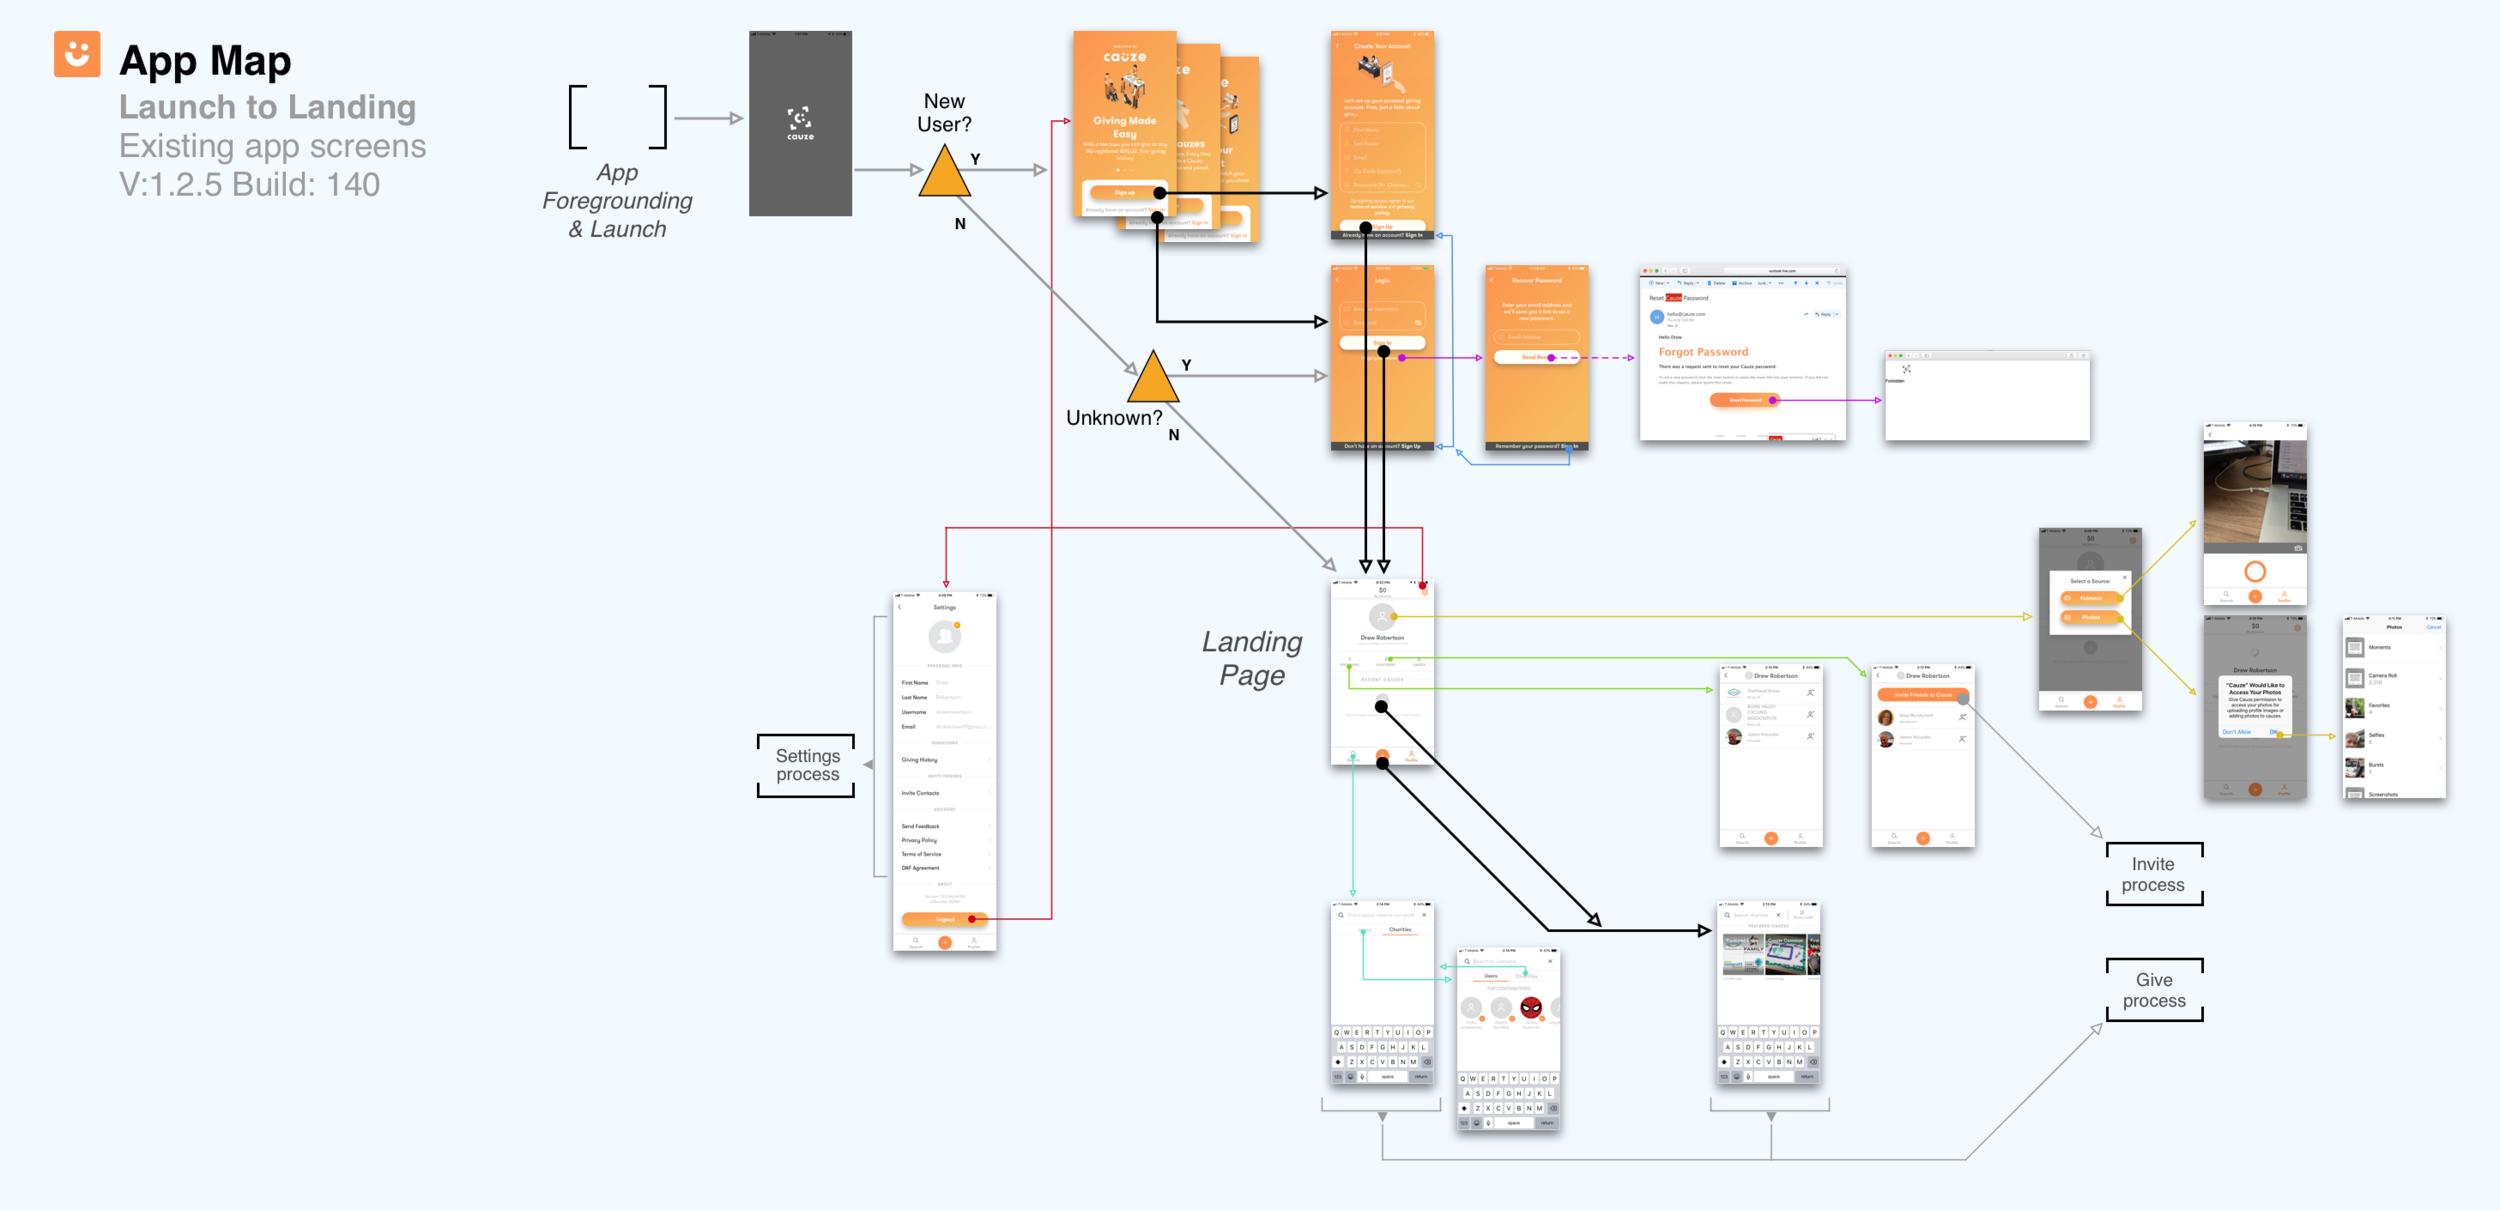 2-App Map.png